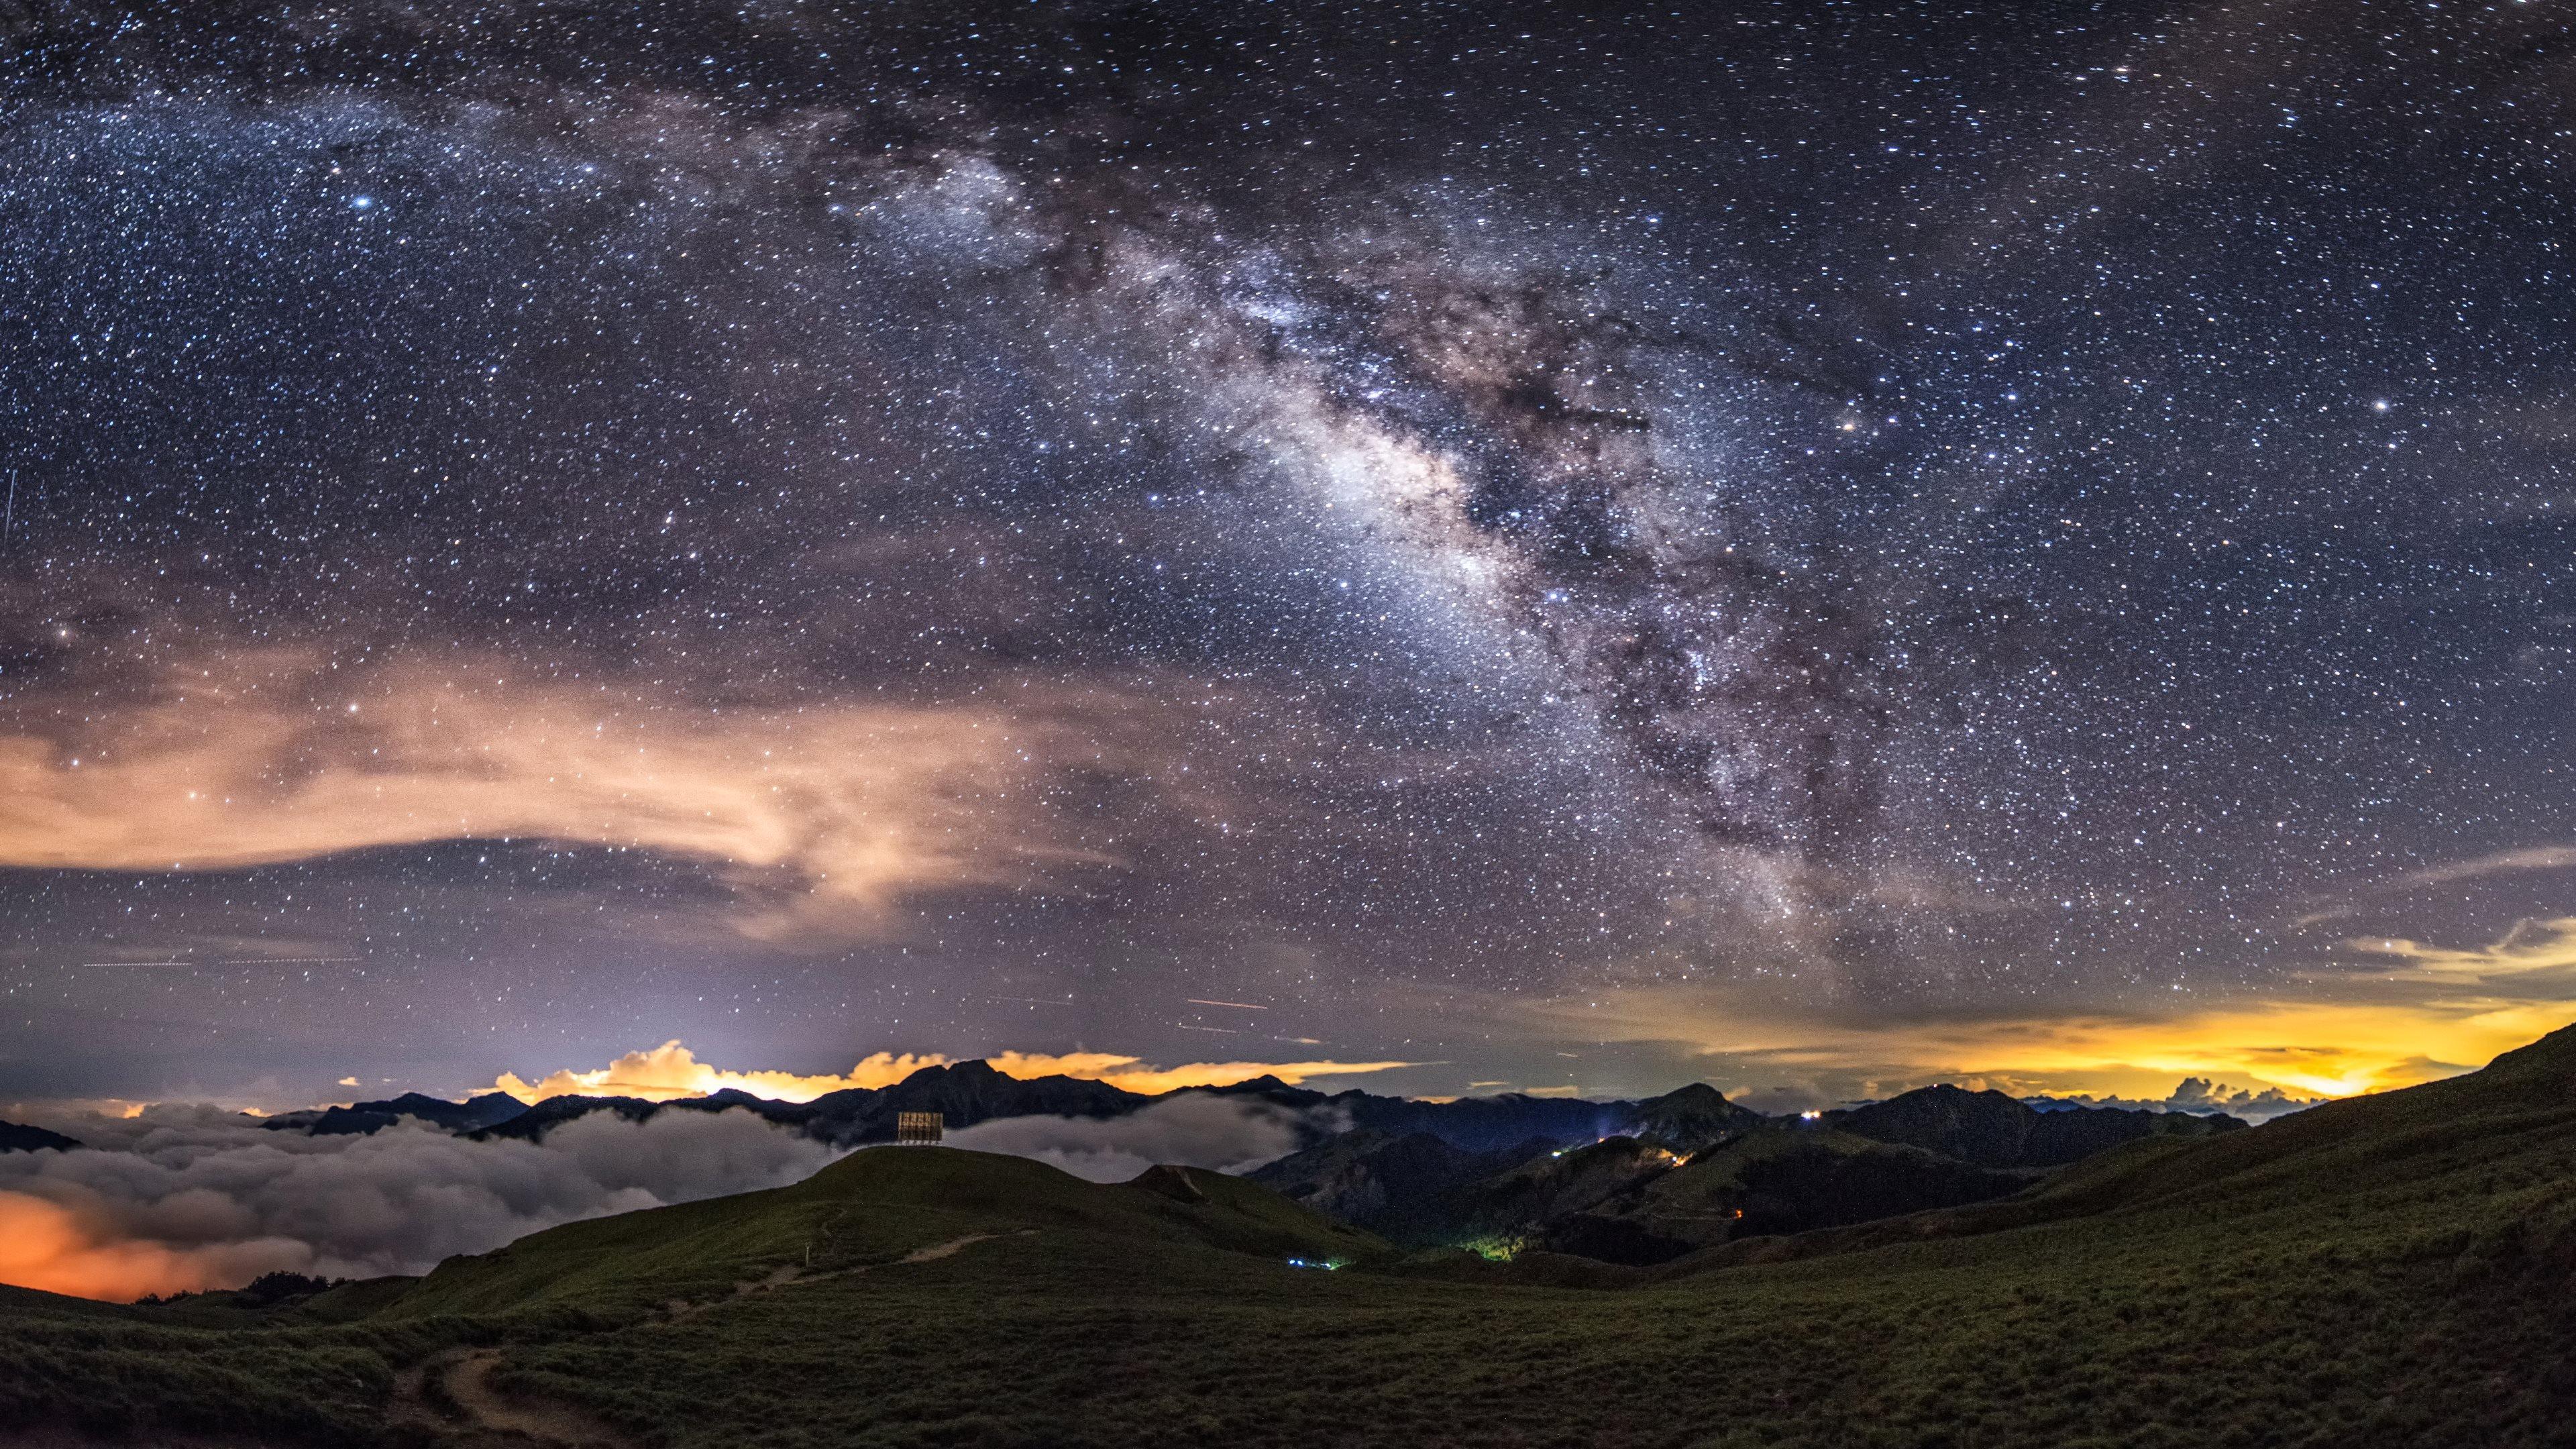 Milky Way on the night sky 3840x2160